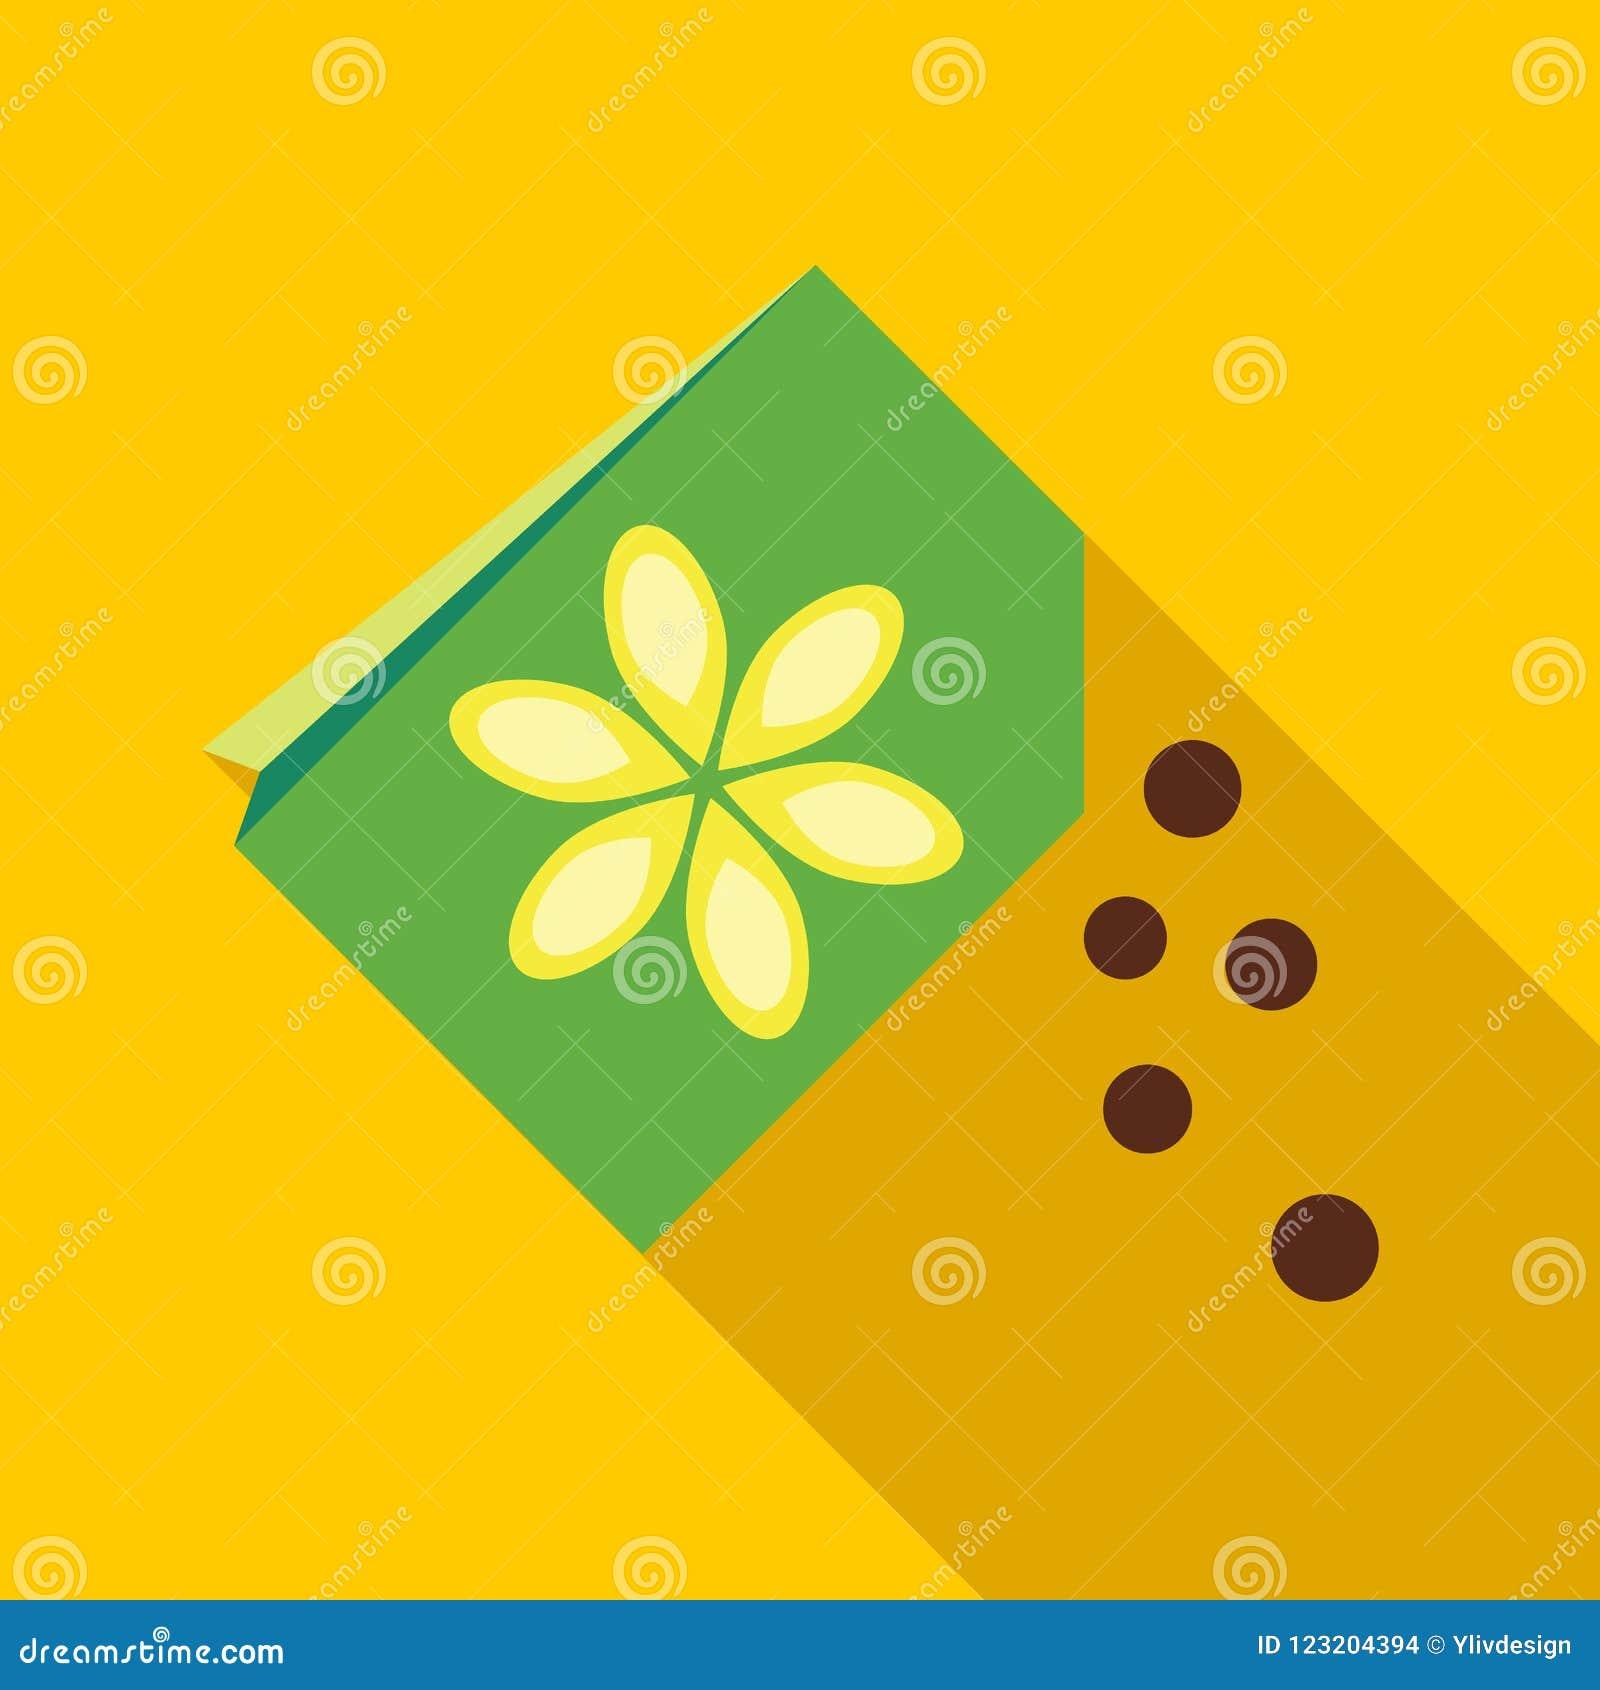 Paper Bag With Flower Seeds Icon Stock Illustration Illustration